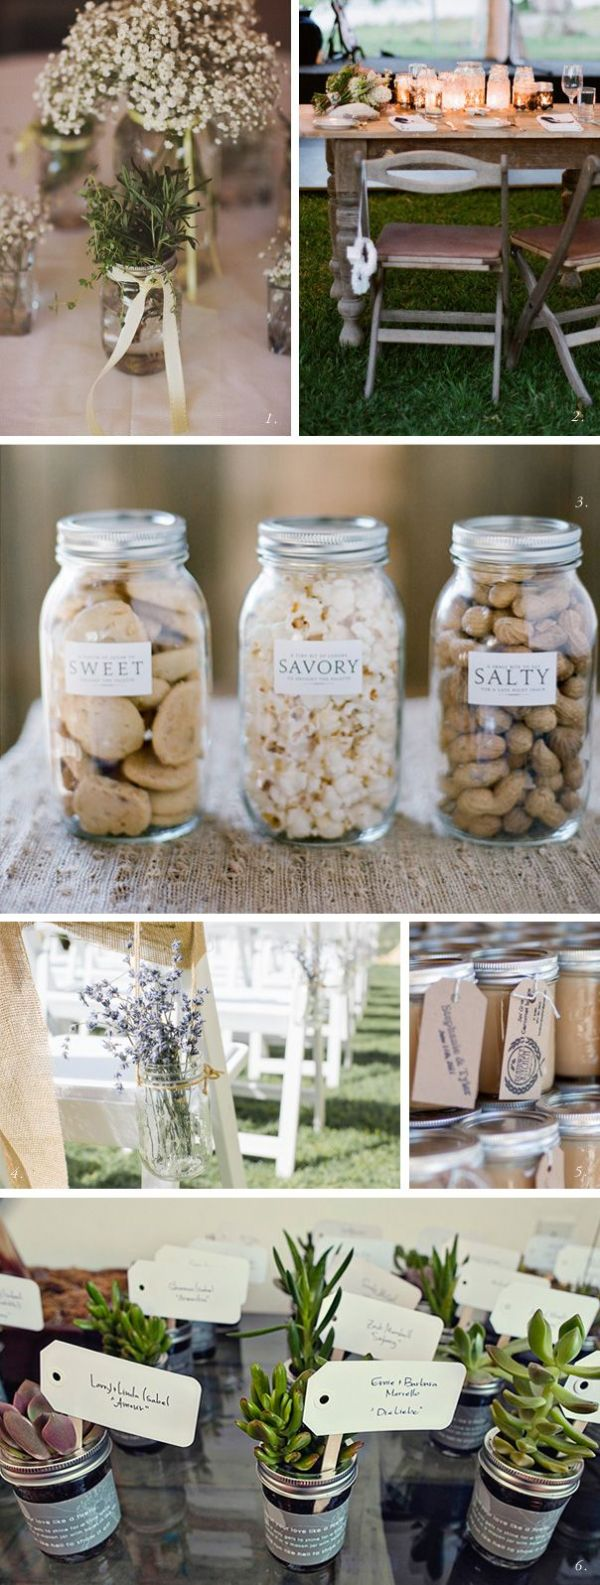 1000+ ideas about Vintage Mason Jars on Pinterest | Buy ...